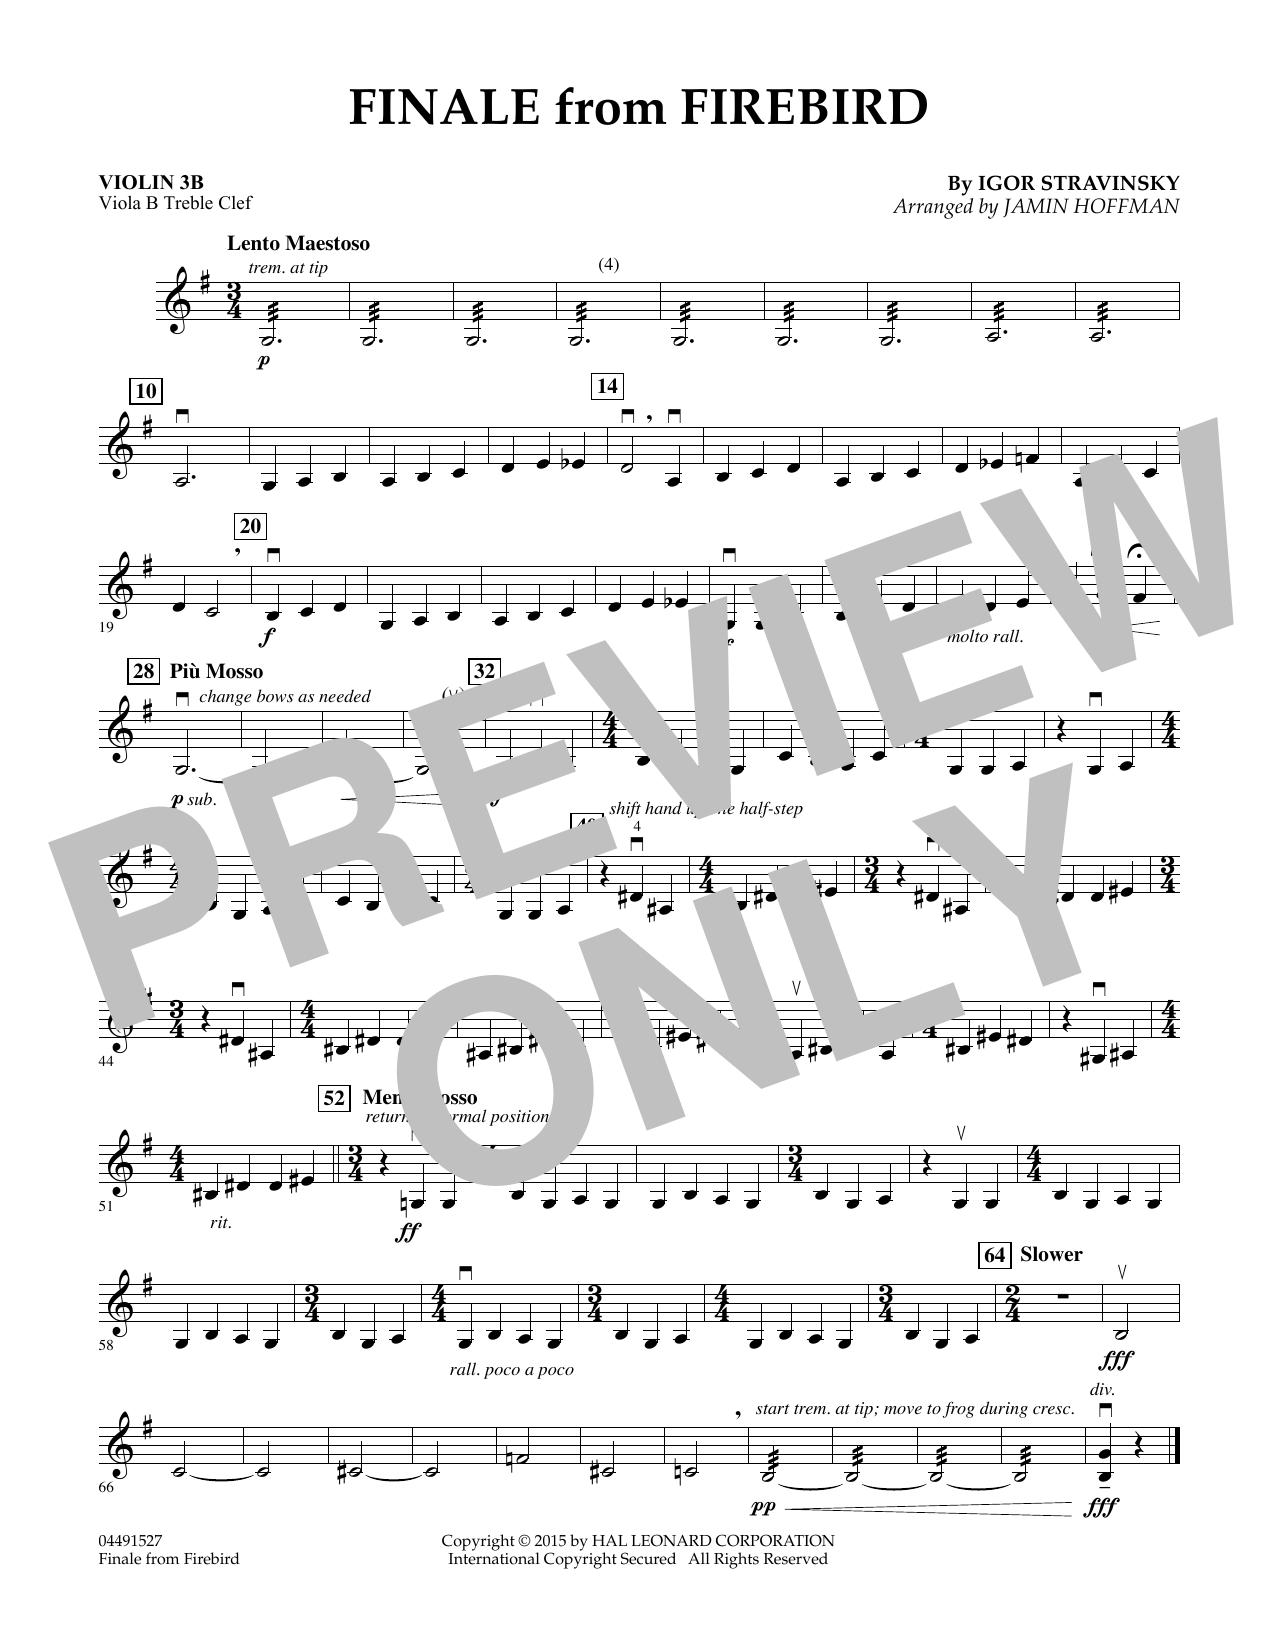 Finale from Firebird (arr. Jamin Hoffman) - Violin 3B (Orchestra)